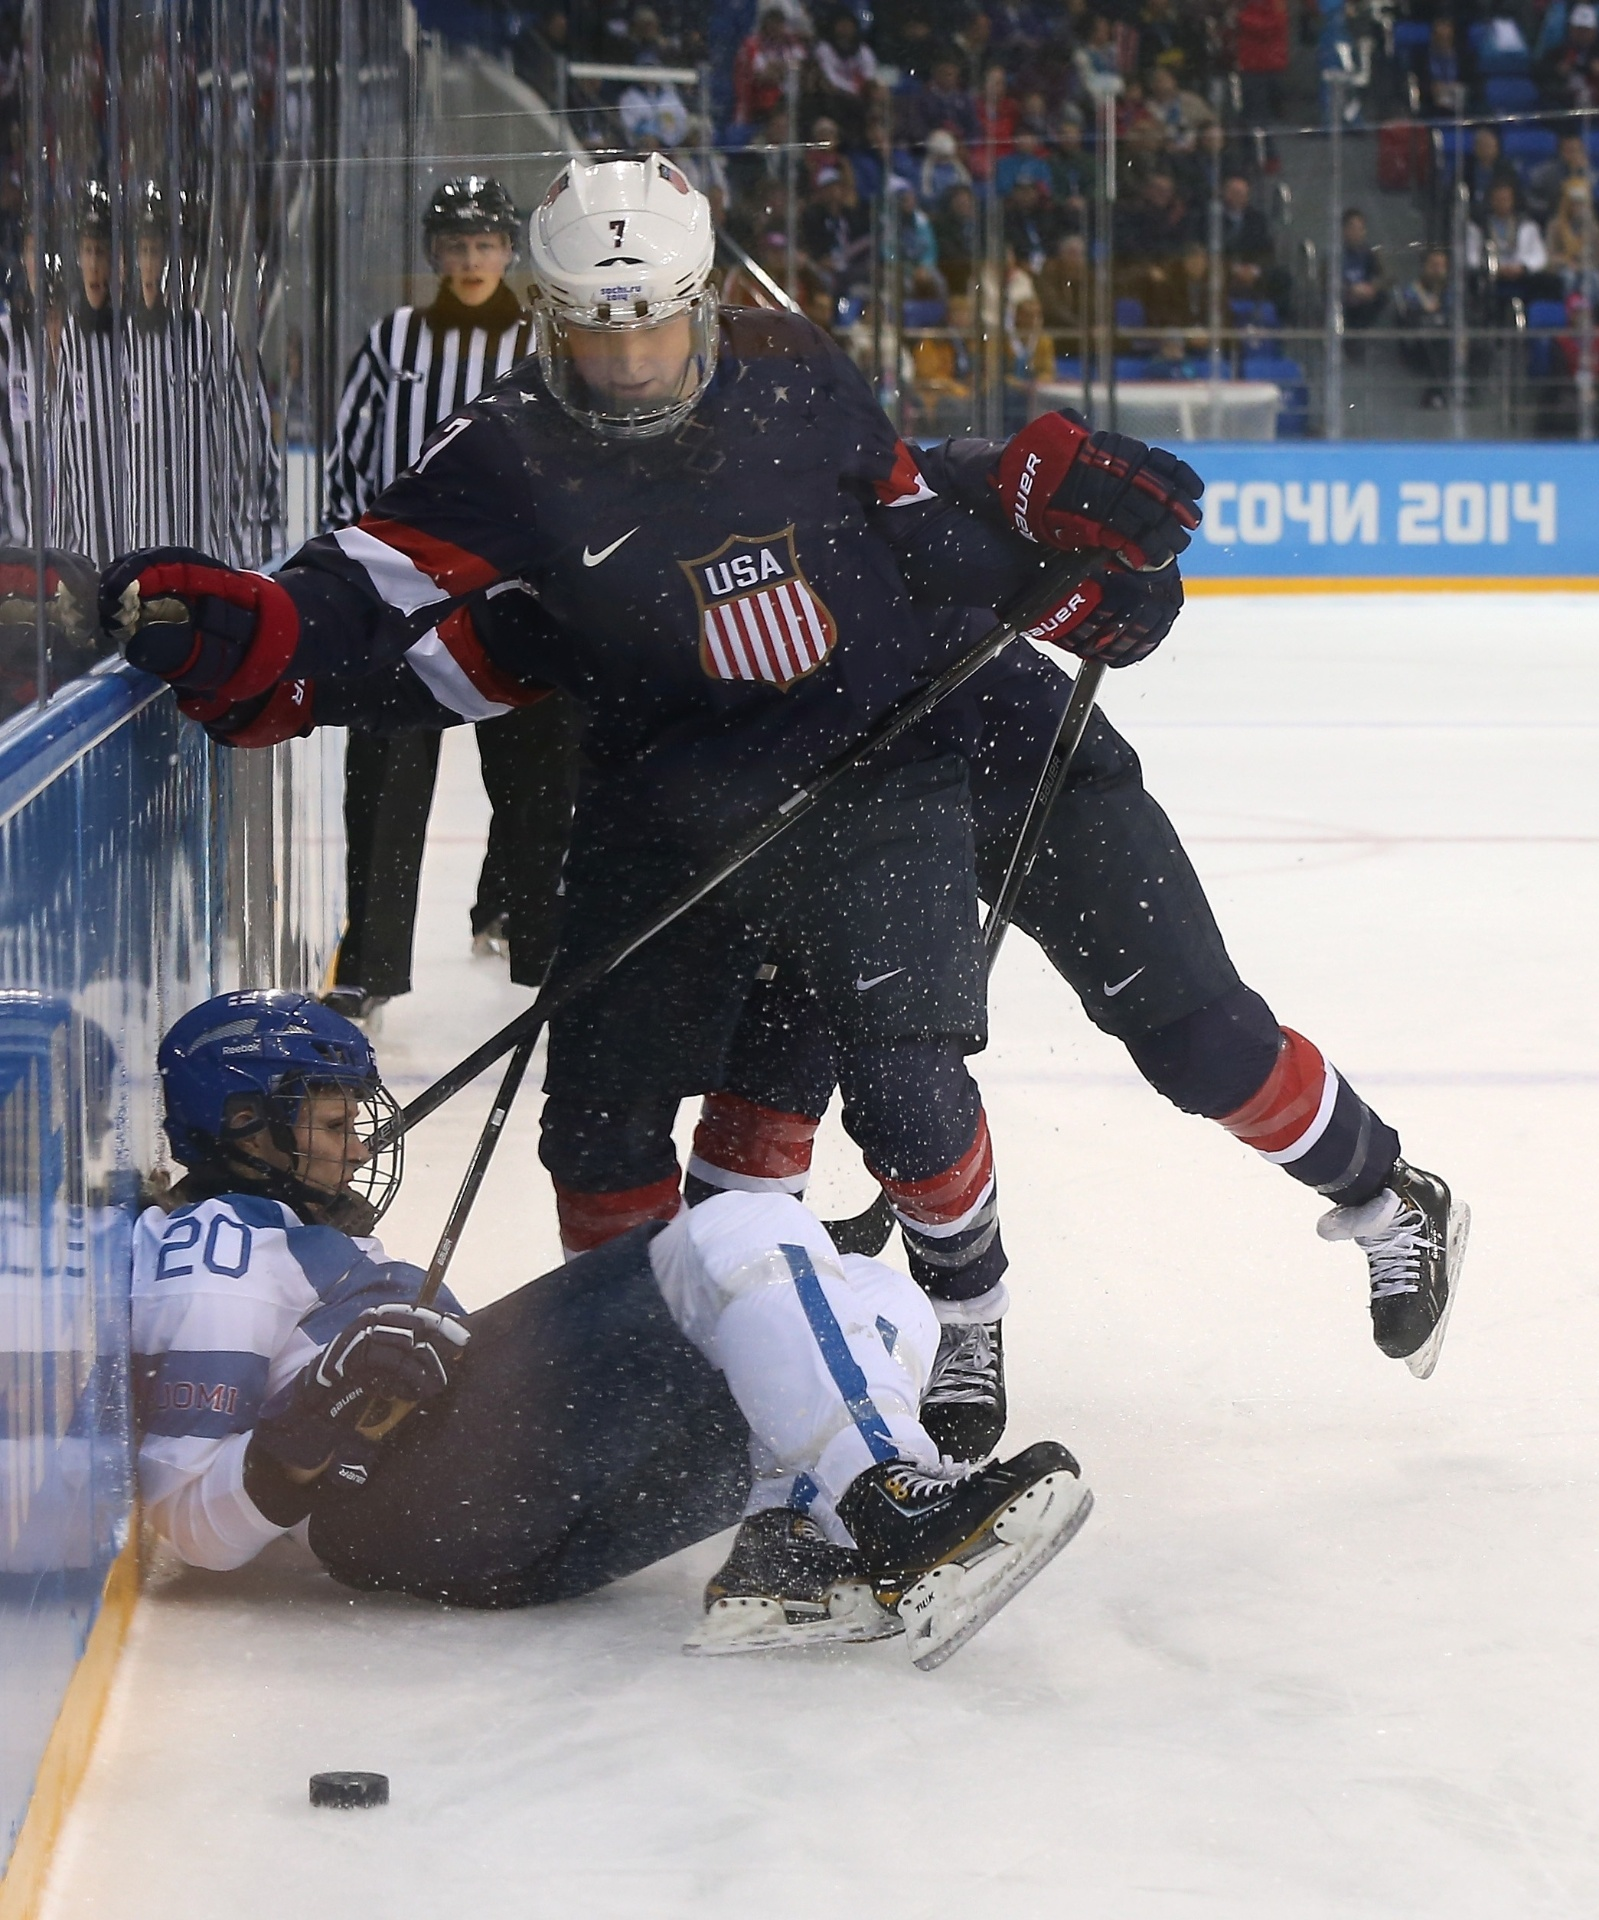 08.02.2014 - A norte-americana Monique Lamoureux (em pé) empurra a finlandesa Saija Tarkki